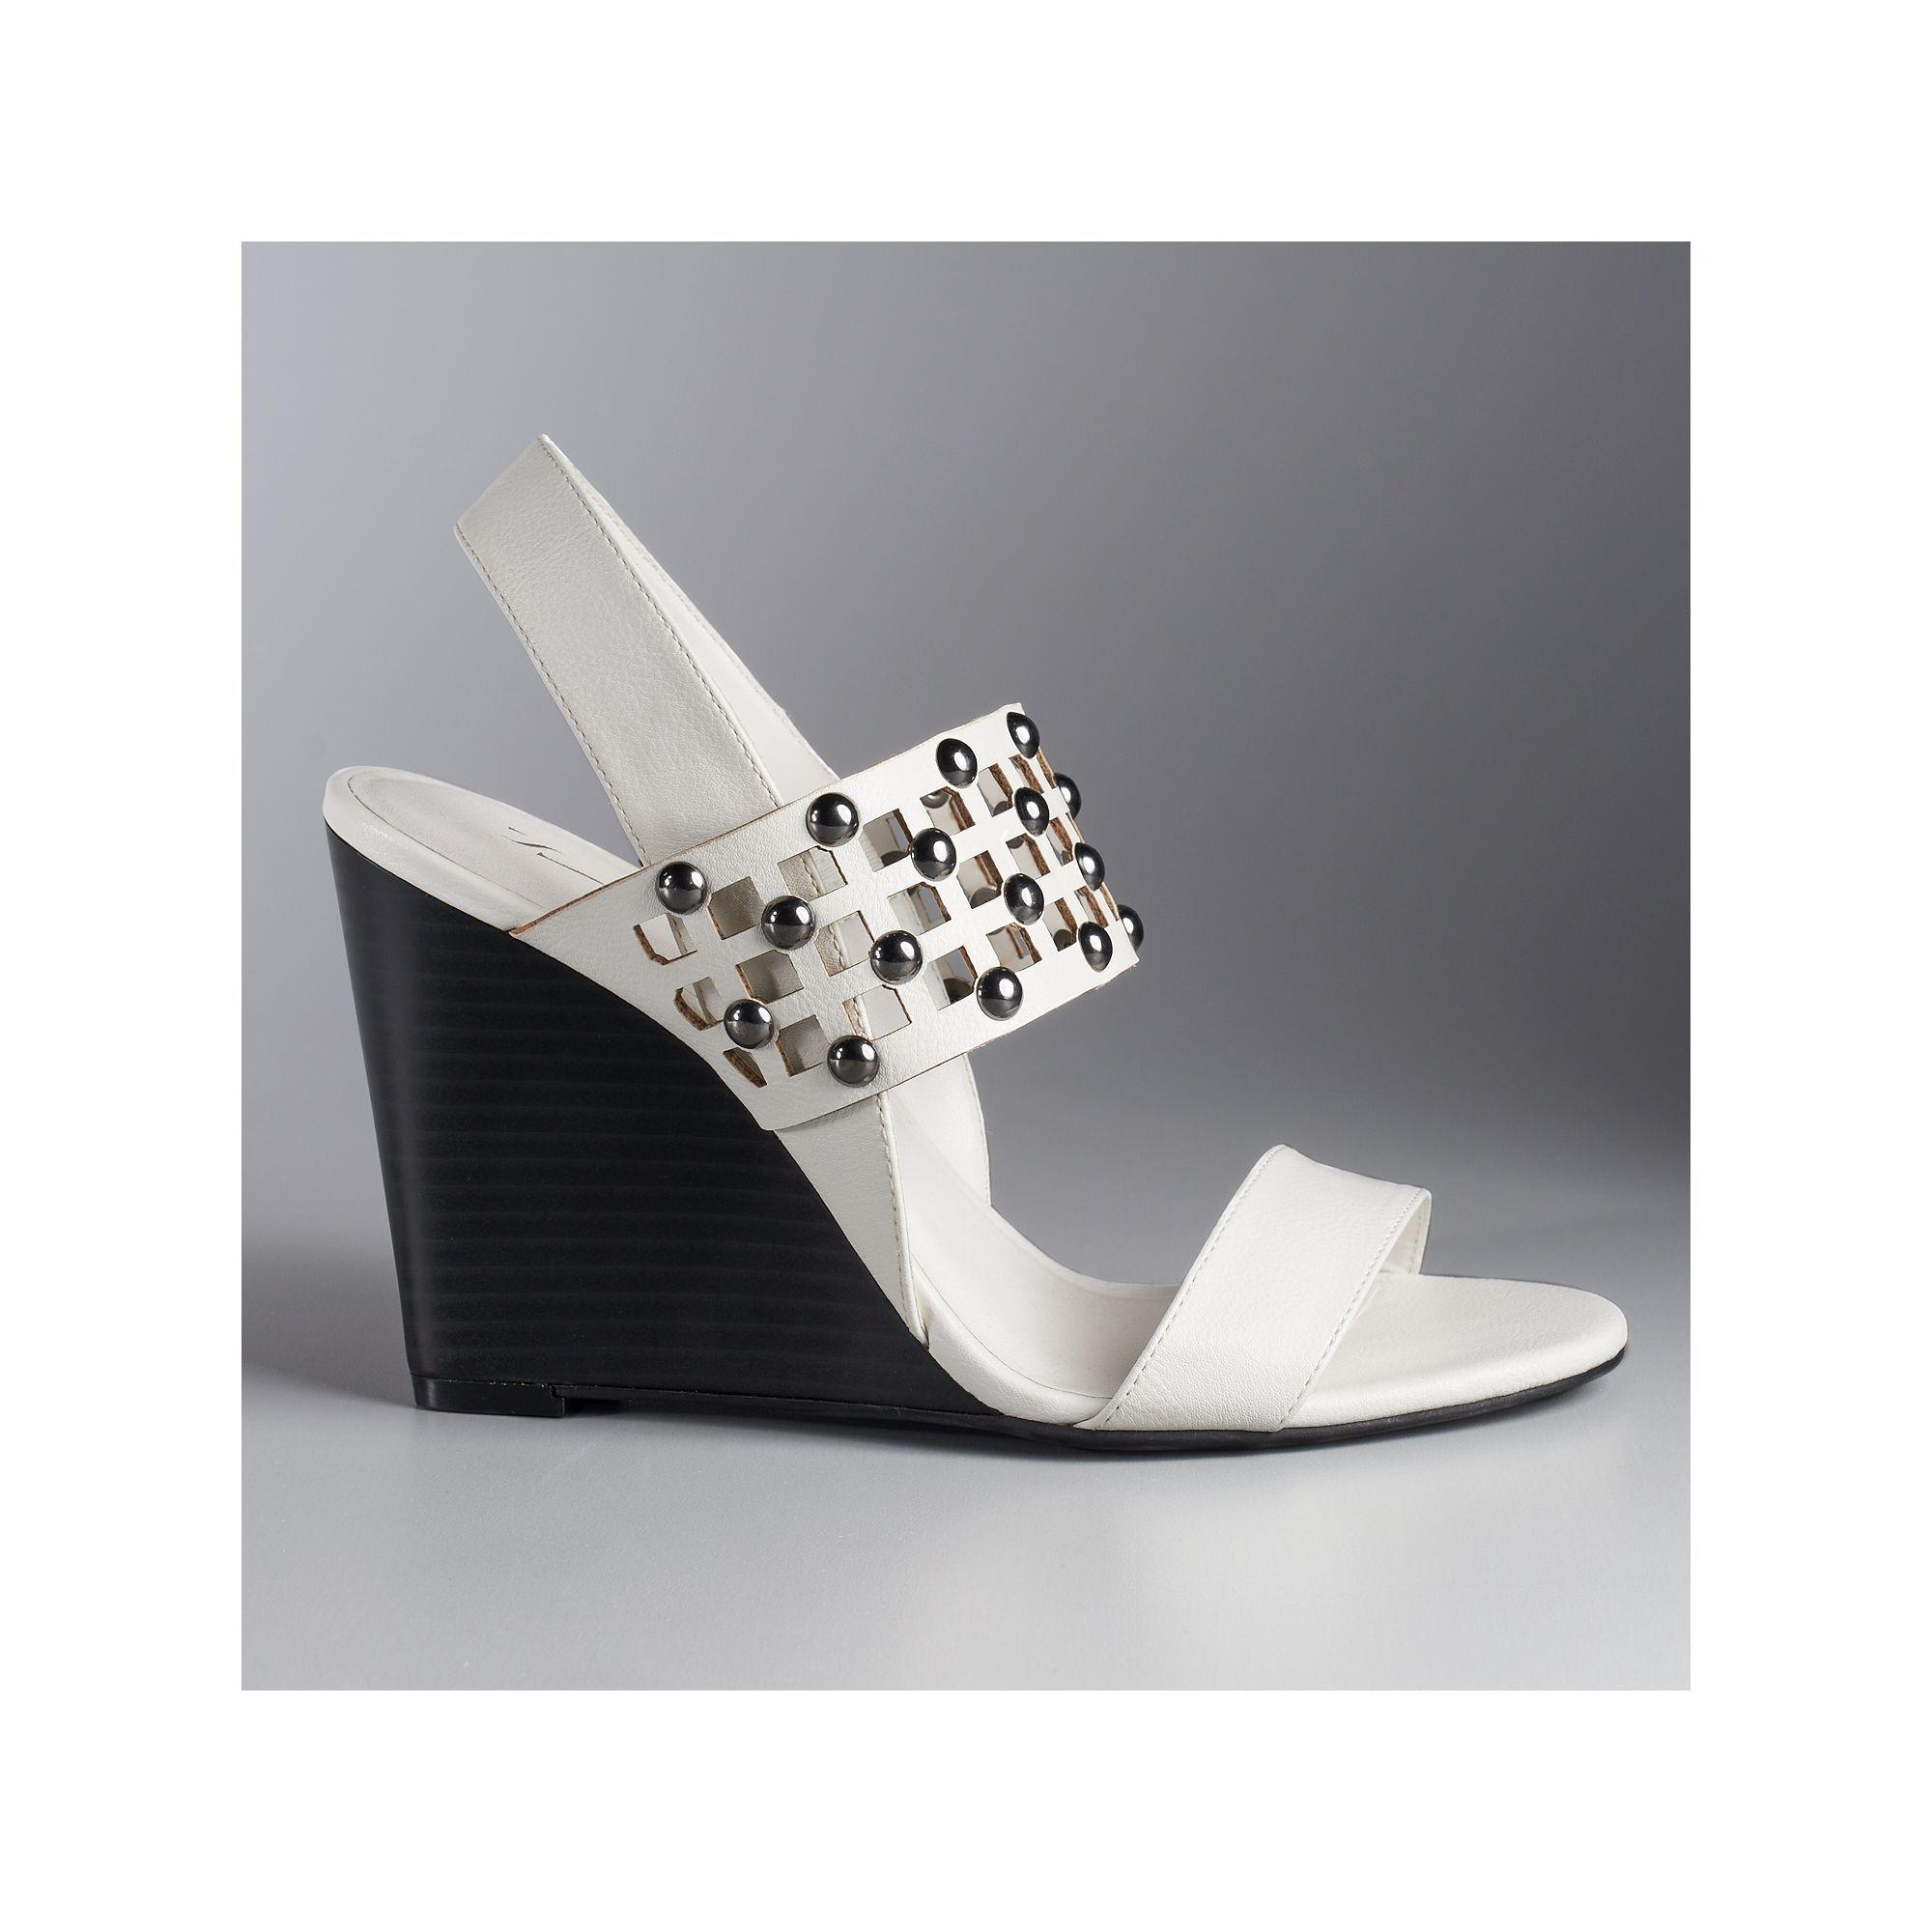 Simply Vera Vera Wang Women's Slingback Wedge Sandals